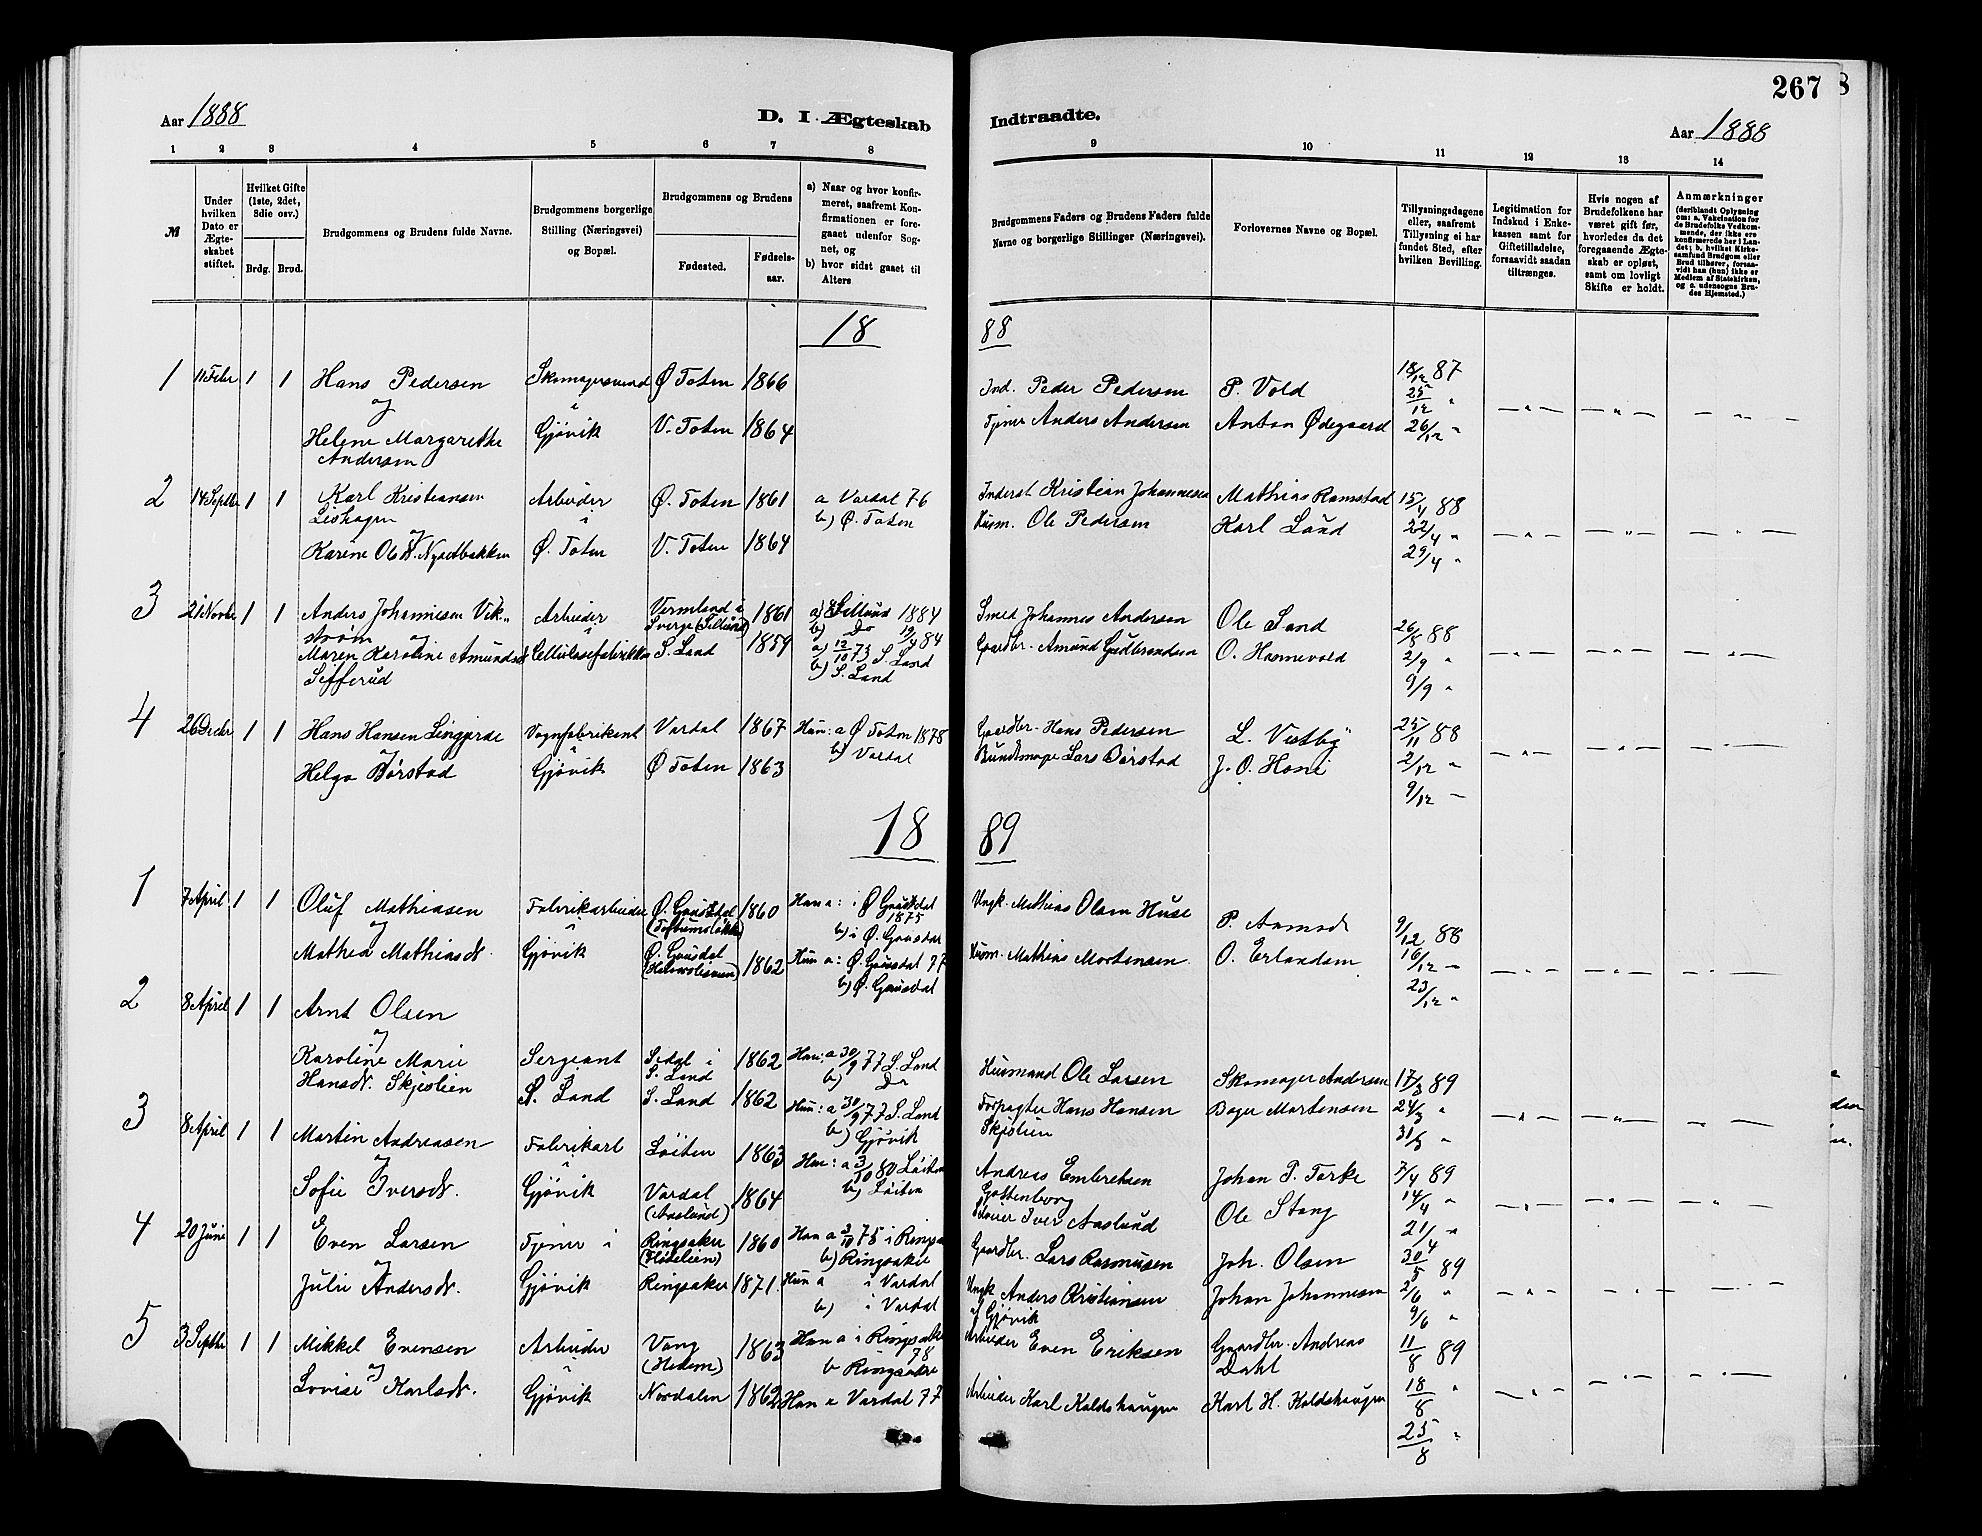 SAH, Vardal prestekontor, H/Ha/Hab/L0007: Klokkerbok nr. 7 /2, 1881-1895, s. 267